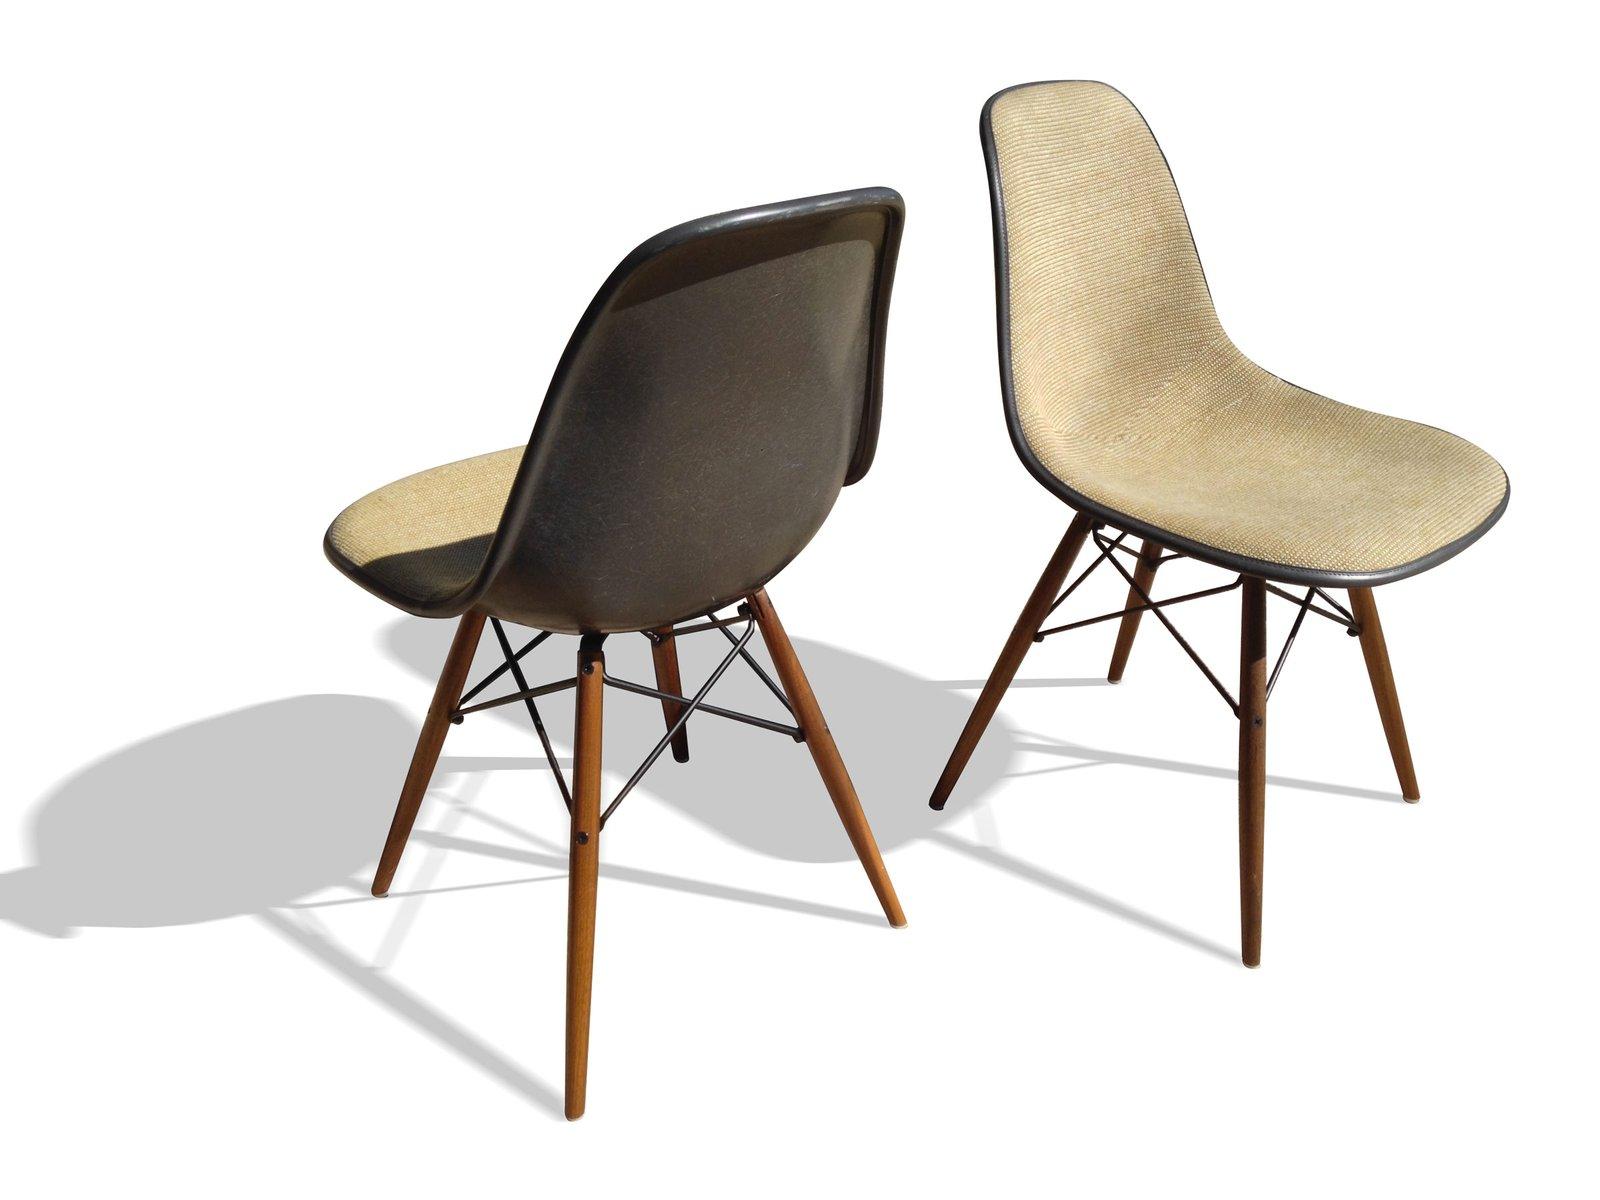 sedie elefante dsw grigie di charles ray eames per herman miller set di 2 in vendita su pamono. Black Bedroom Furniture Sets. Home Design Ideas